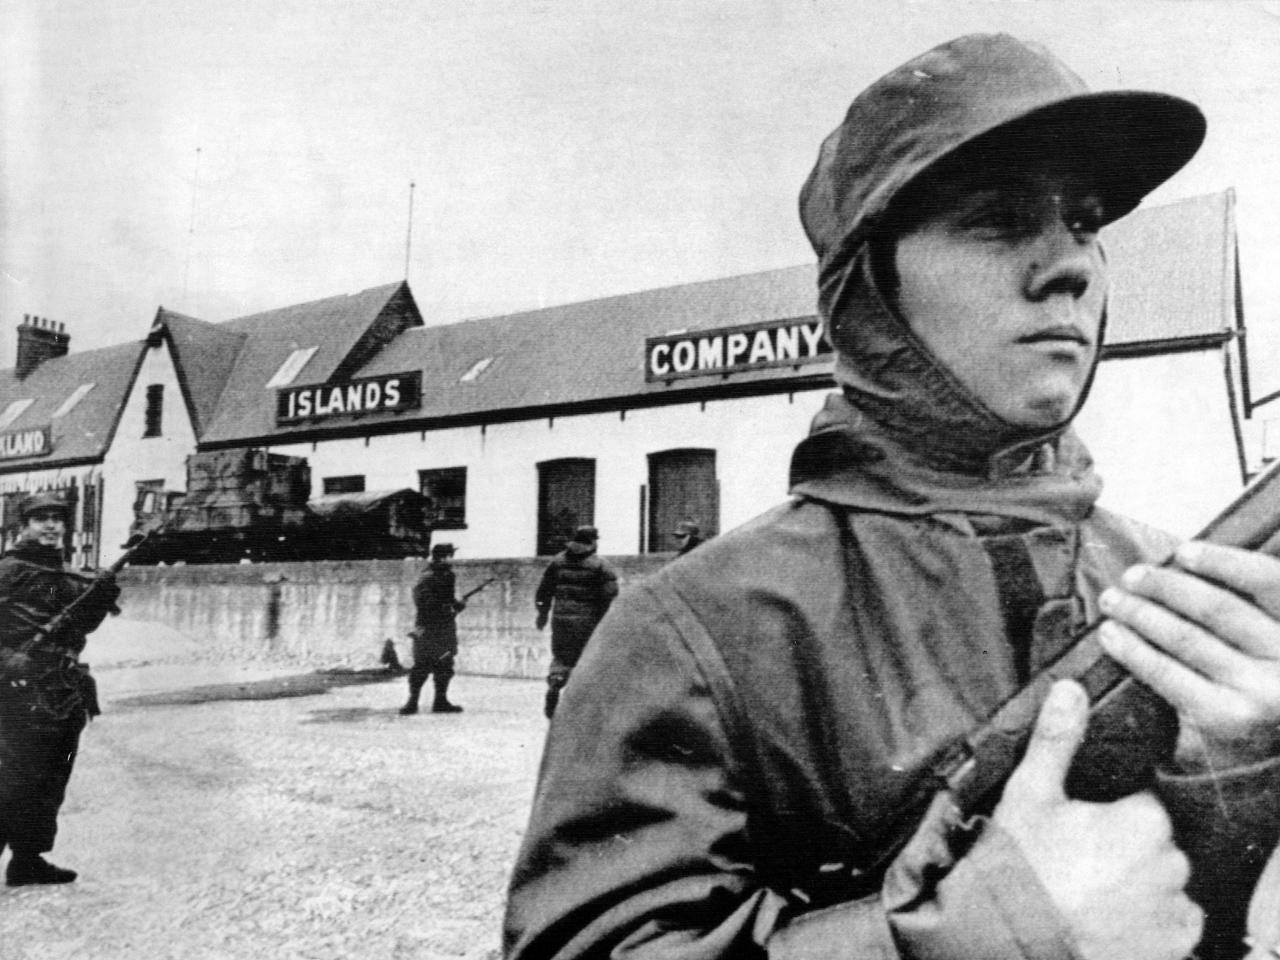 Almanac: The Falklands War